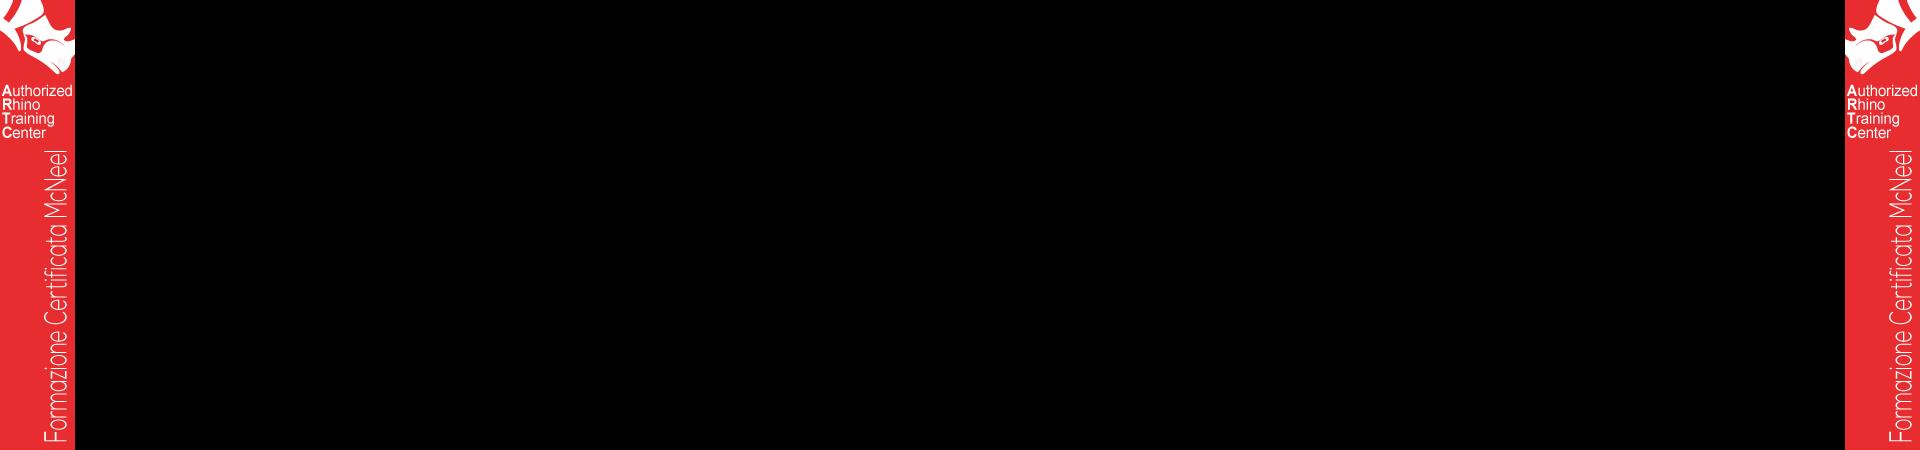 02_bande-laterali-ARTC